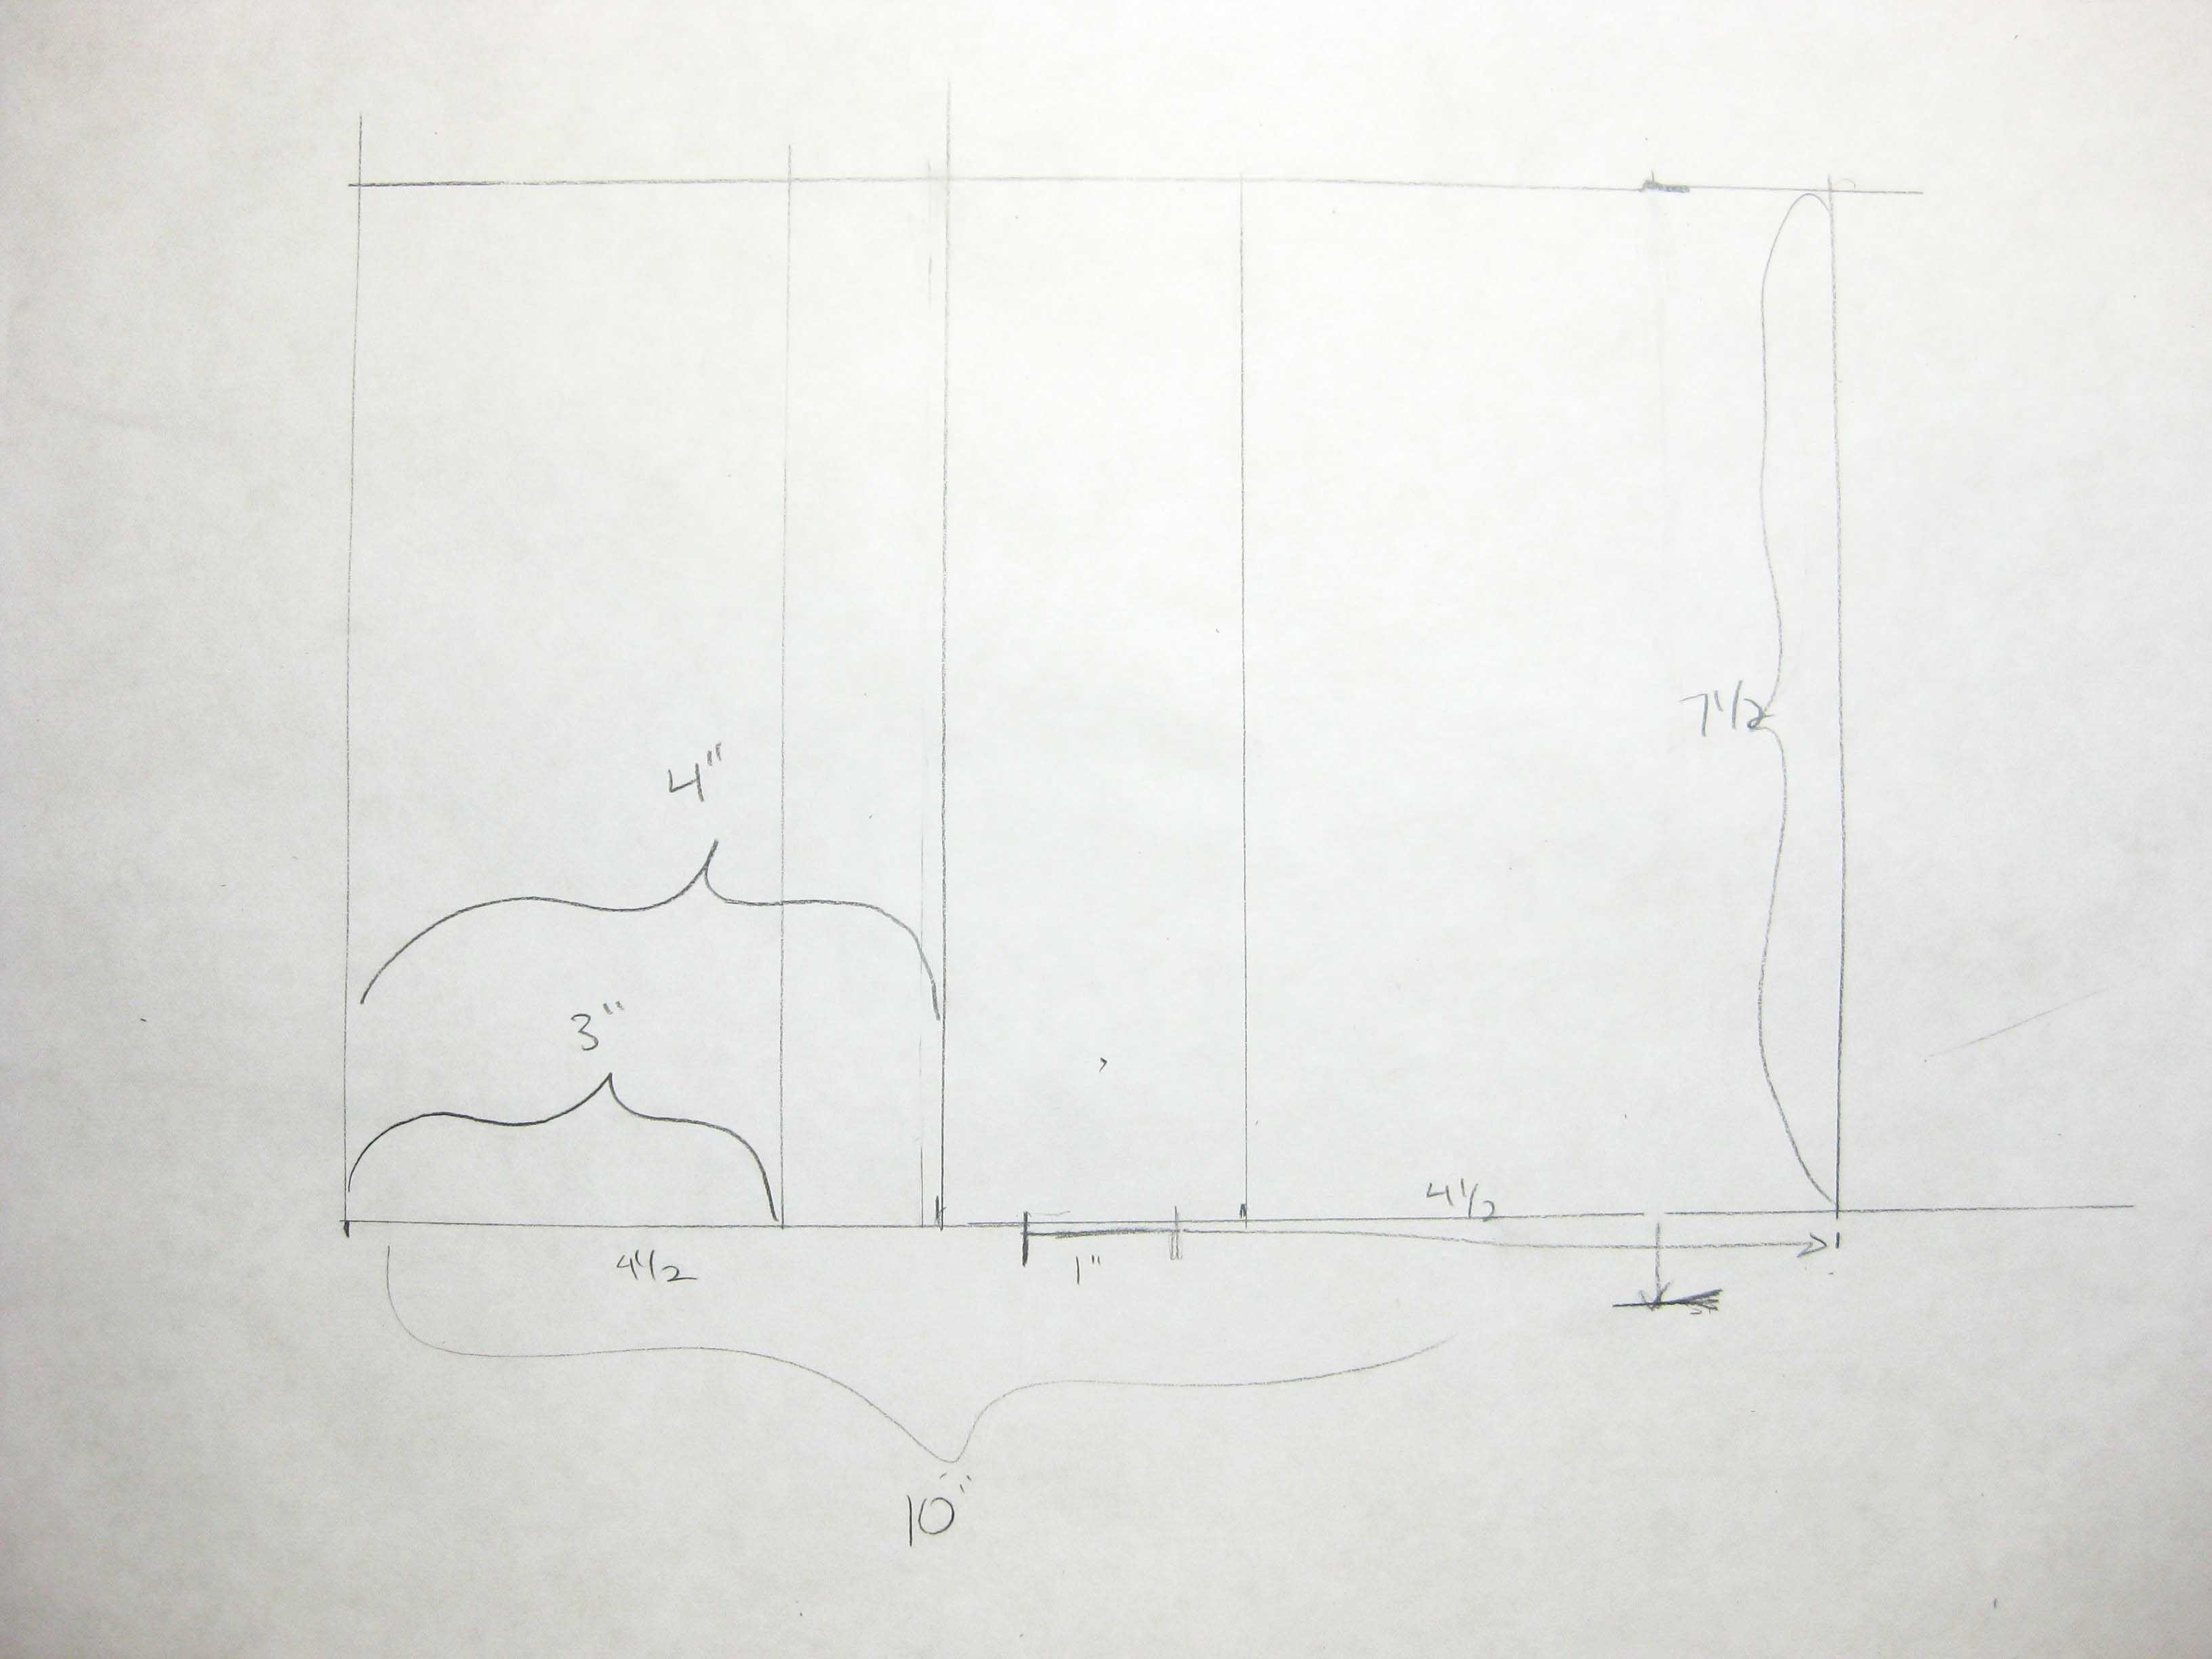 pattern designn1